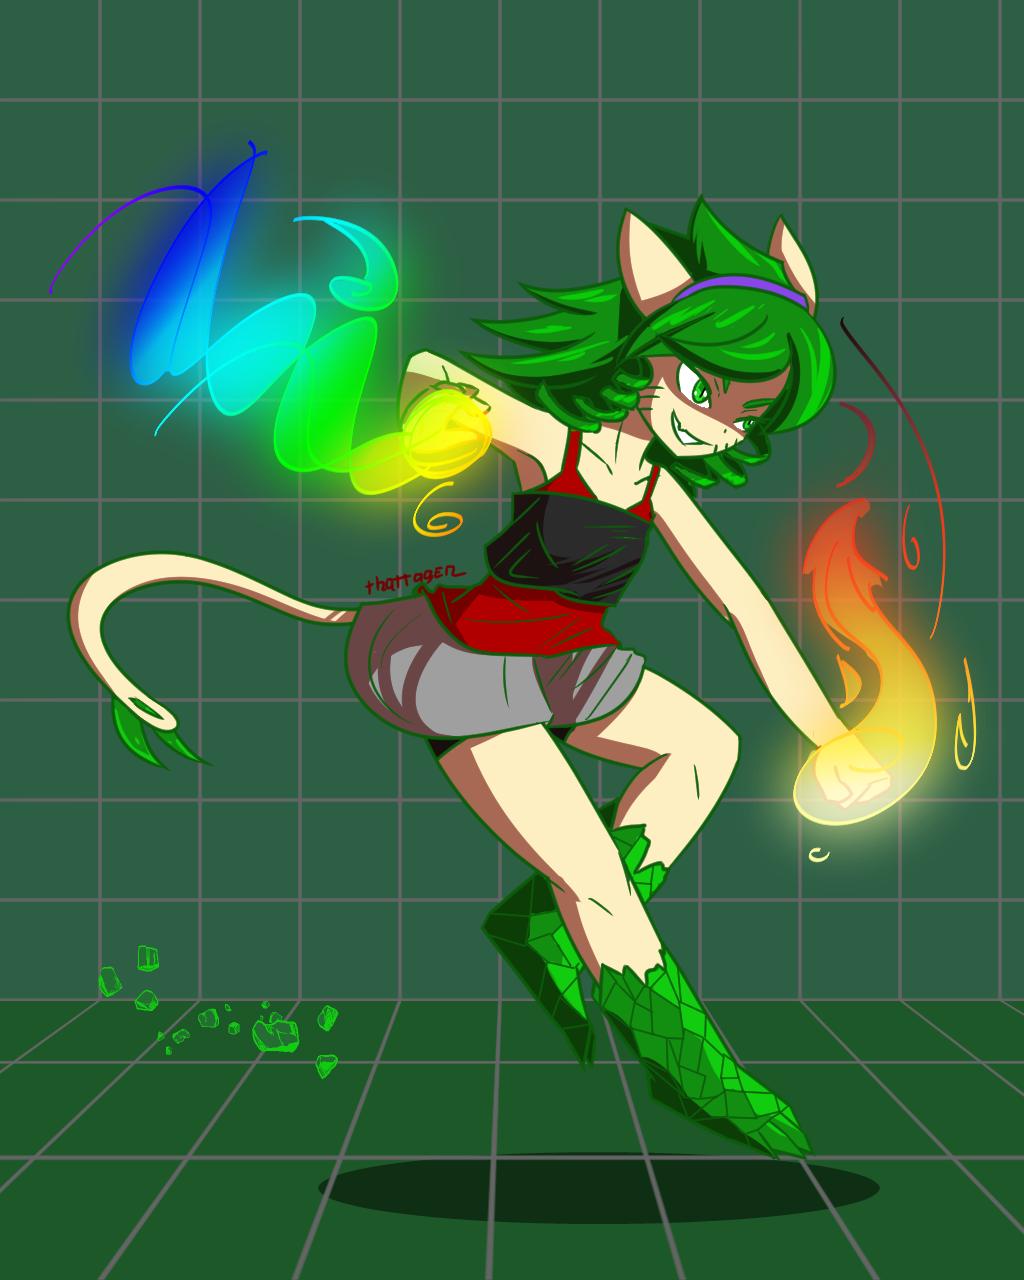 Boki - Alternate Outfit